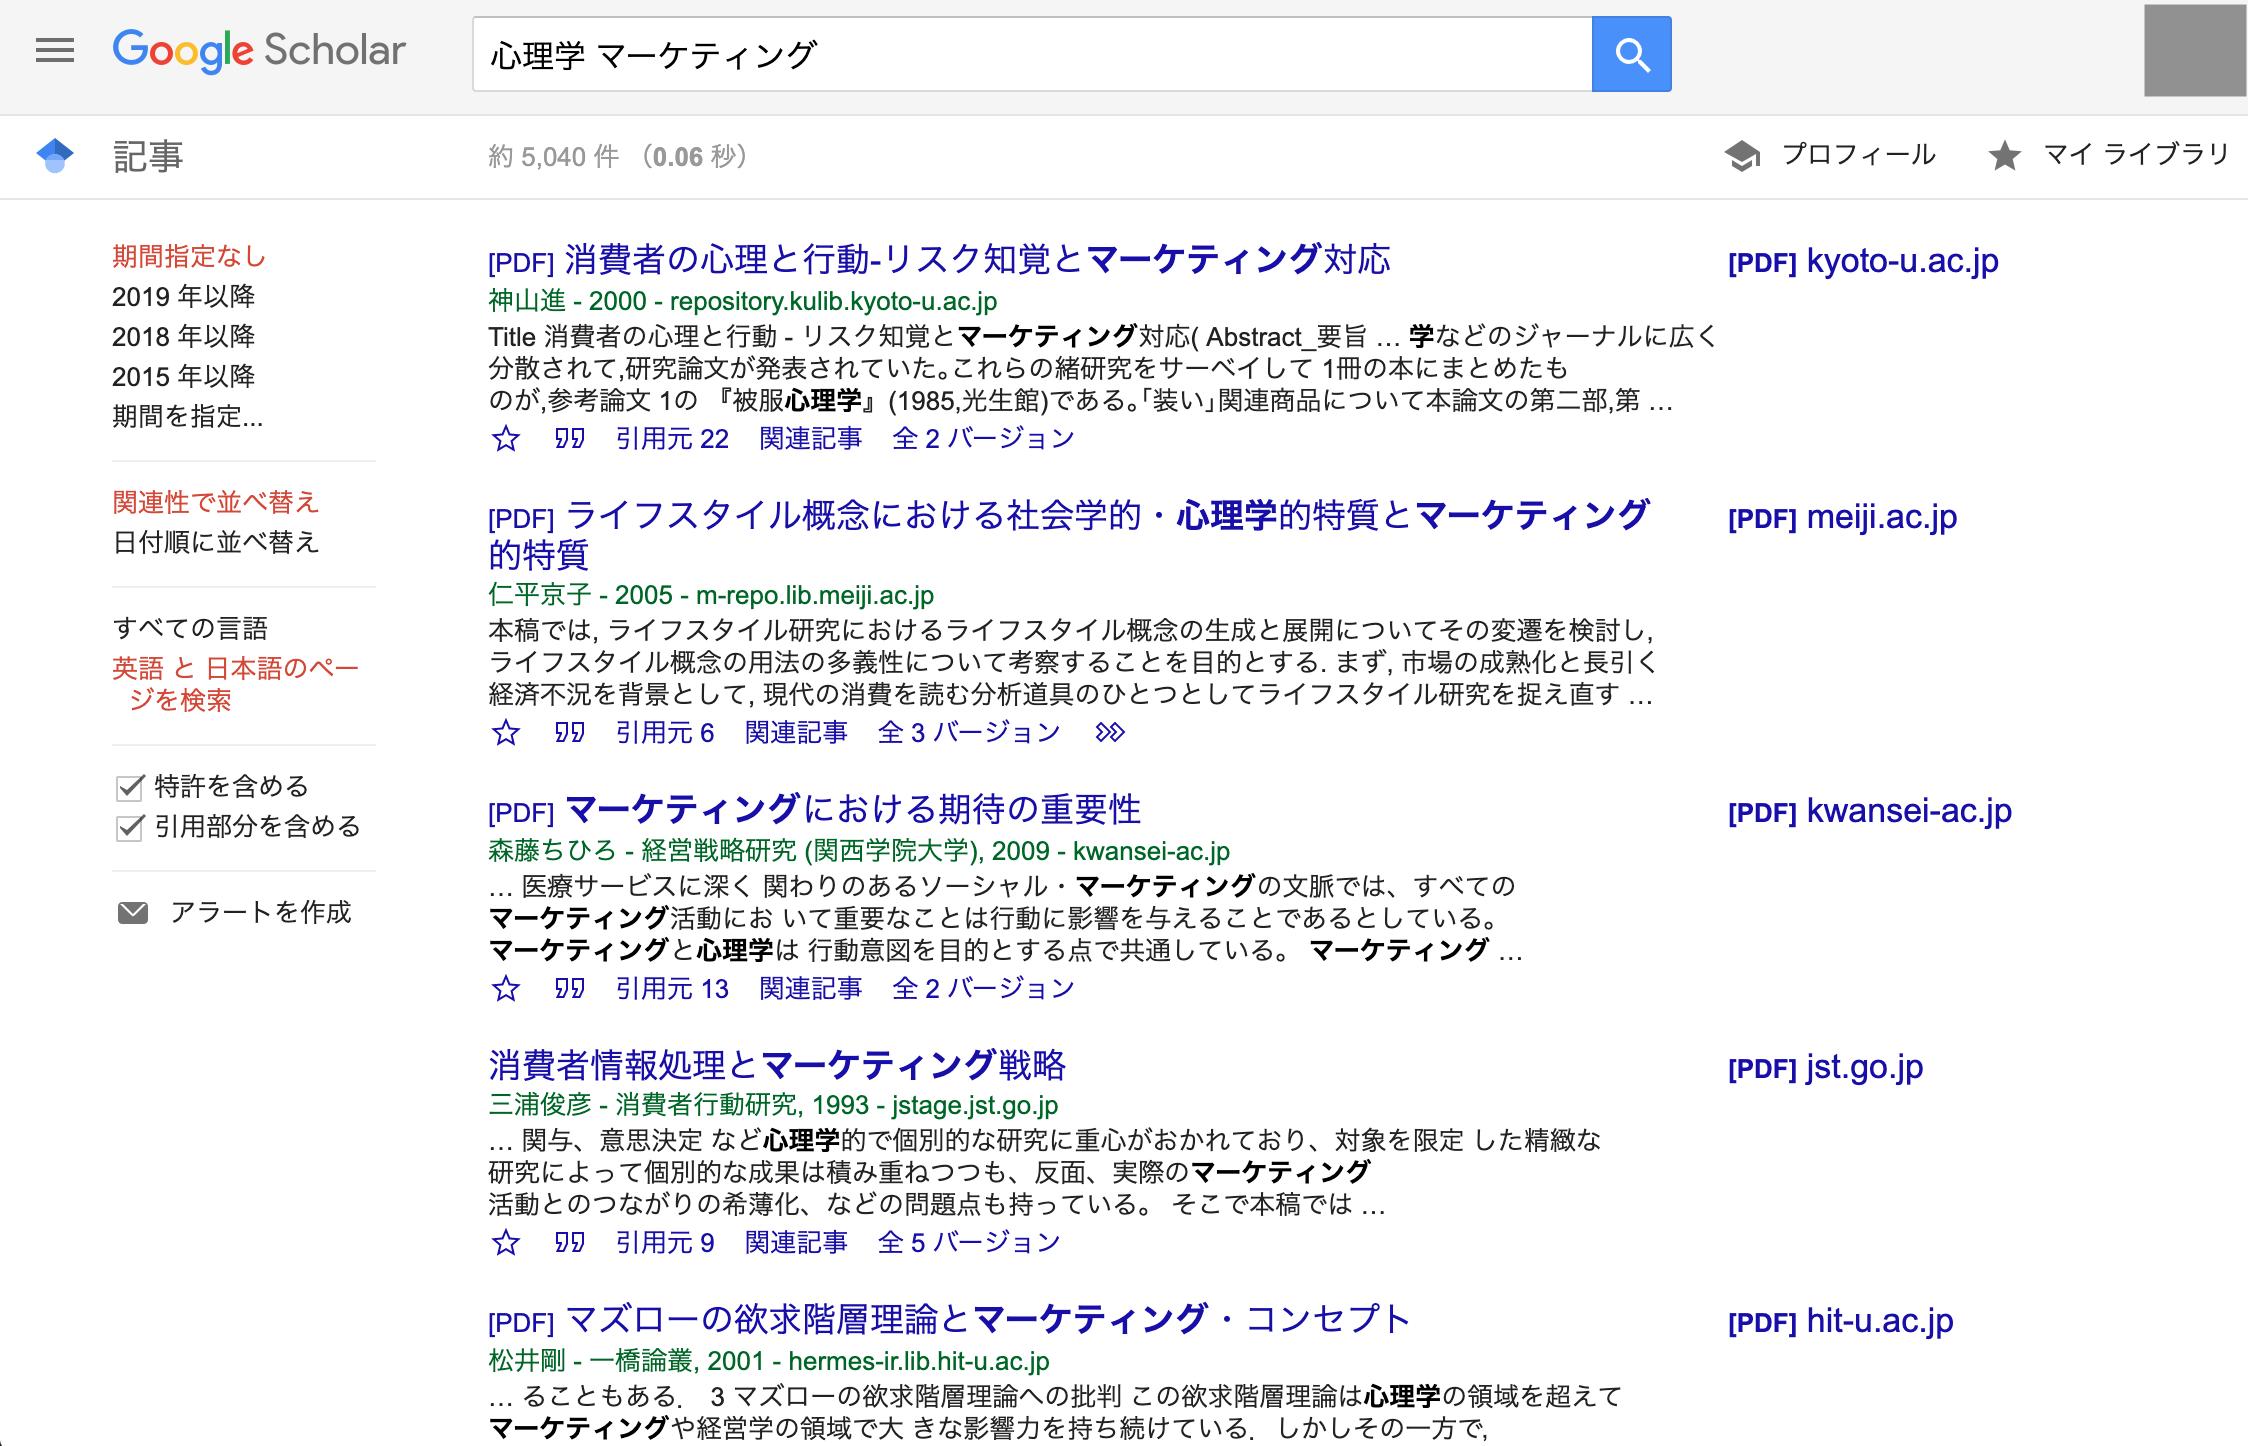 Google scholarの検索結果